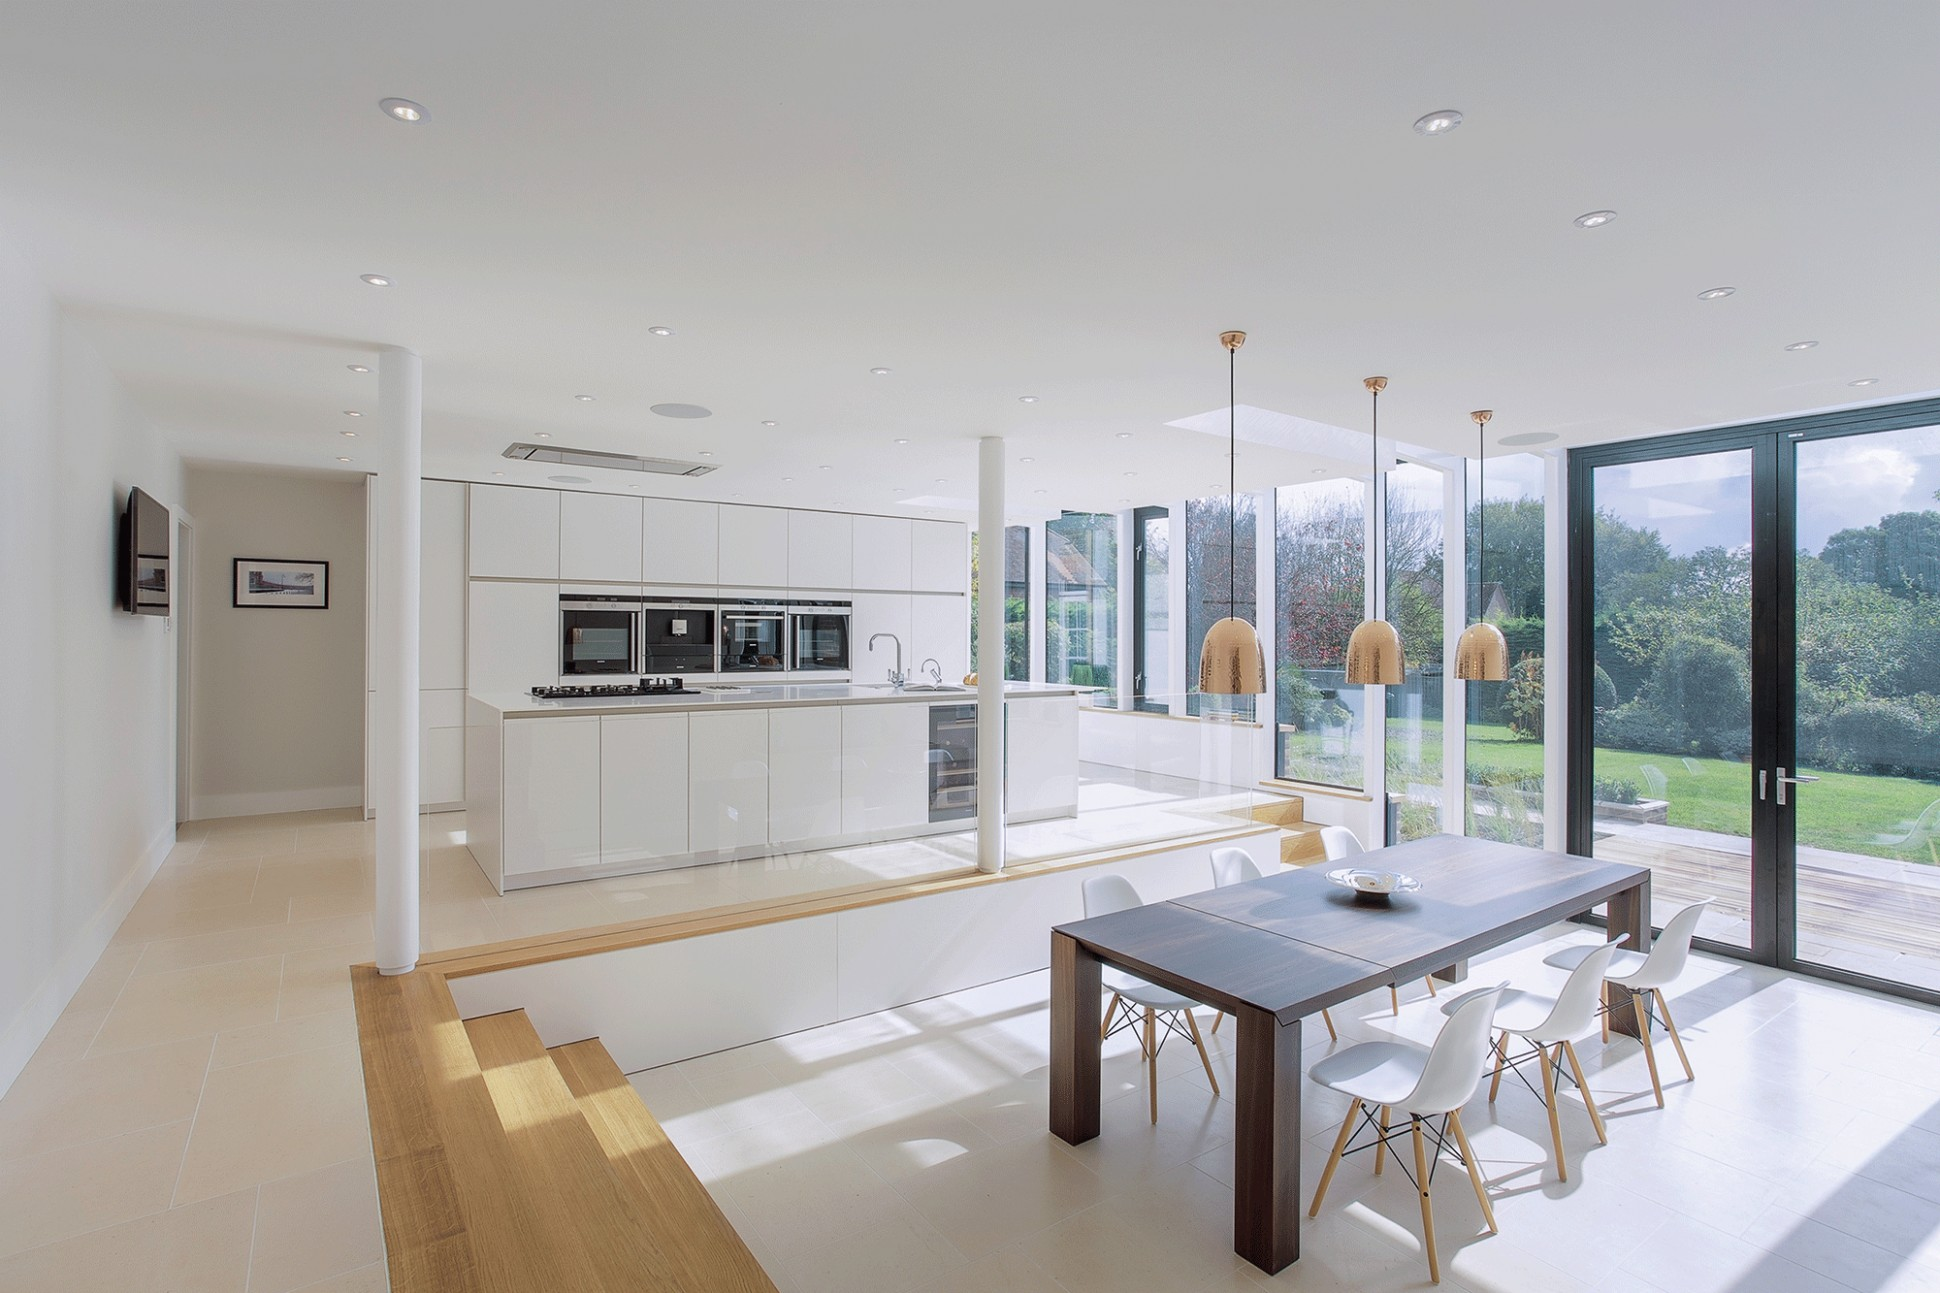 Clever Kitchen Design Ideas - Build It - Kitchen Dining Room Extension Ideas